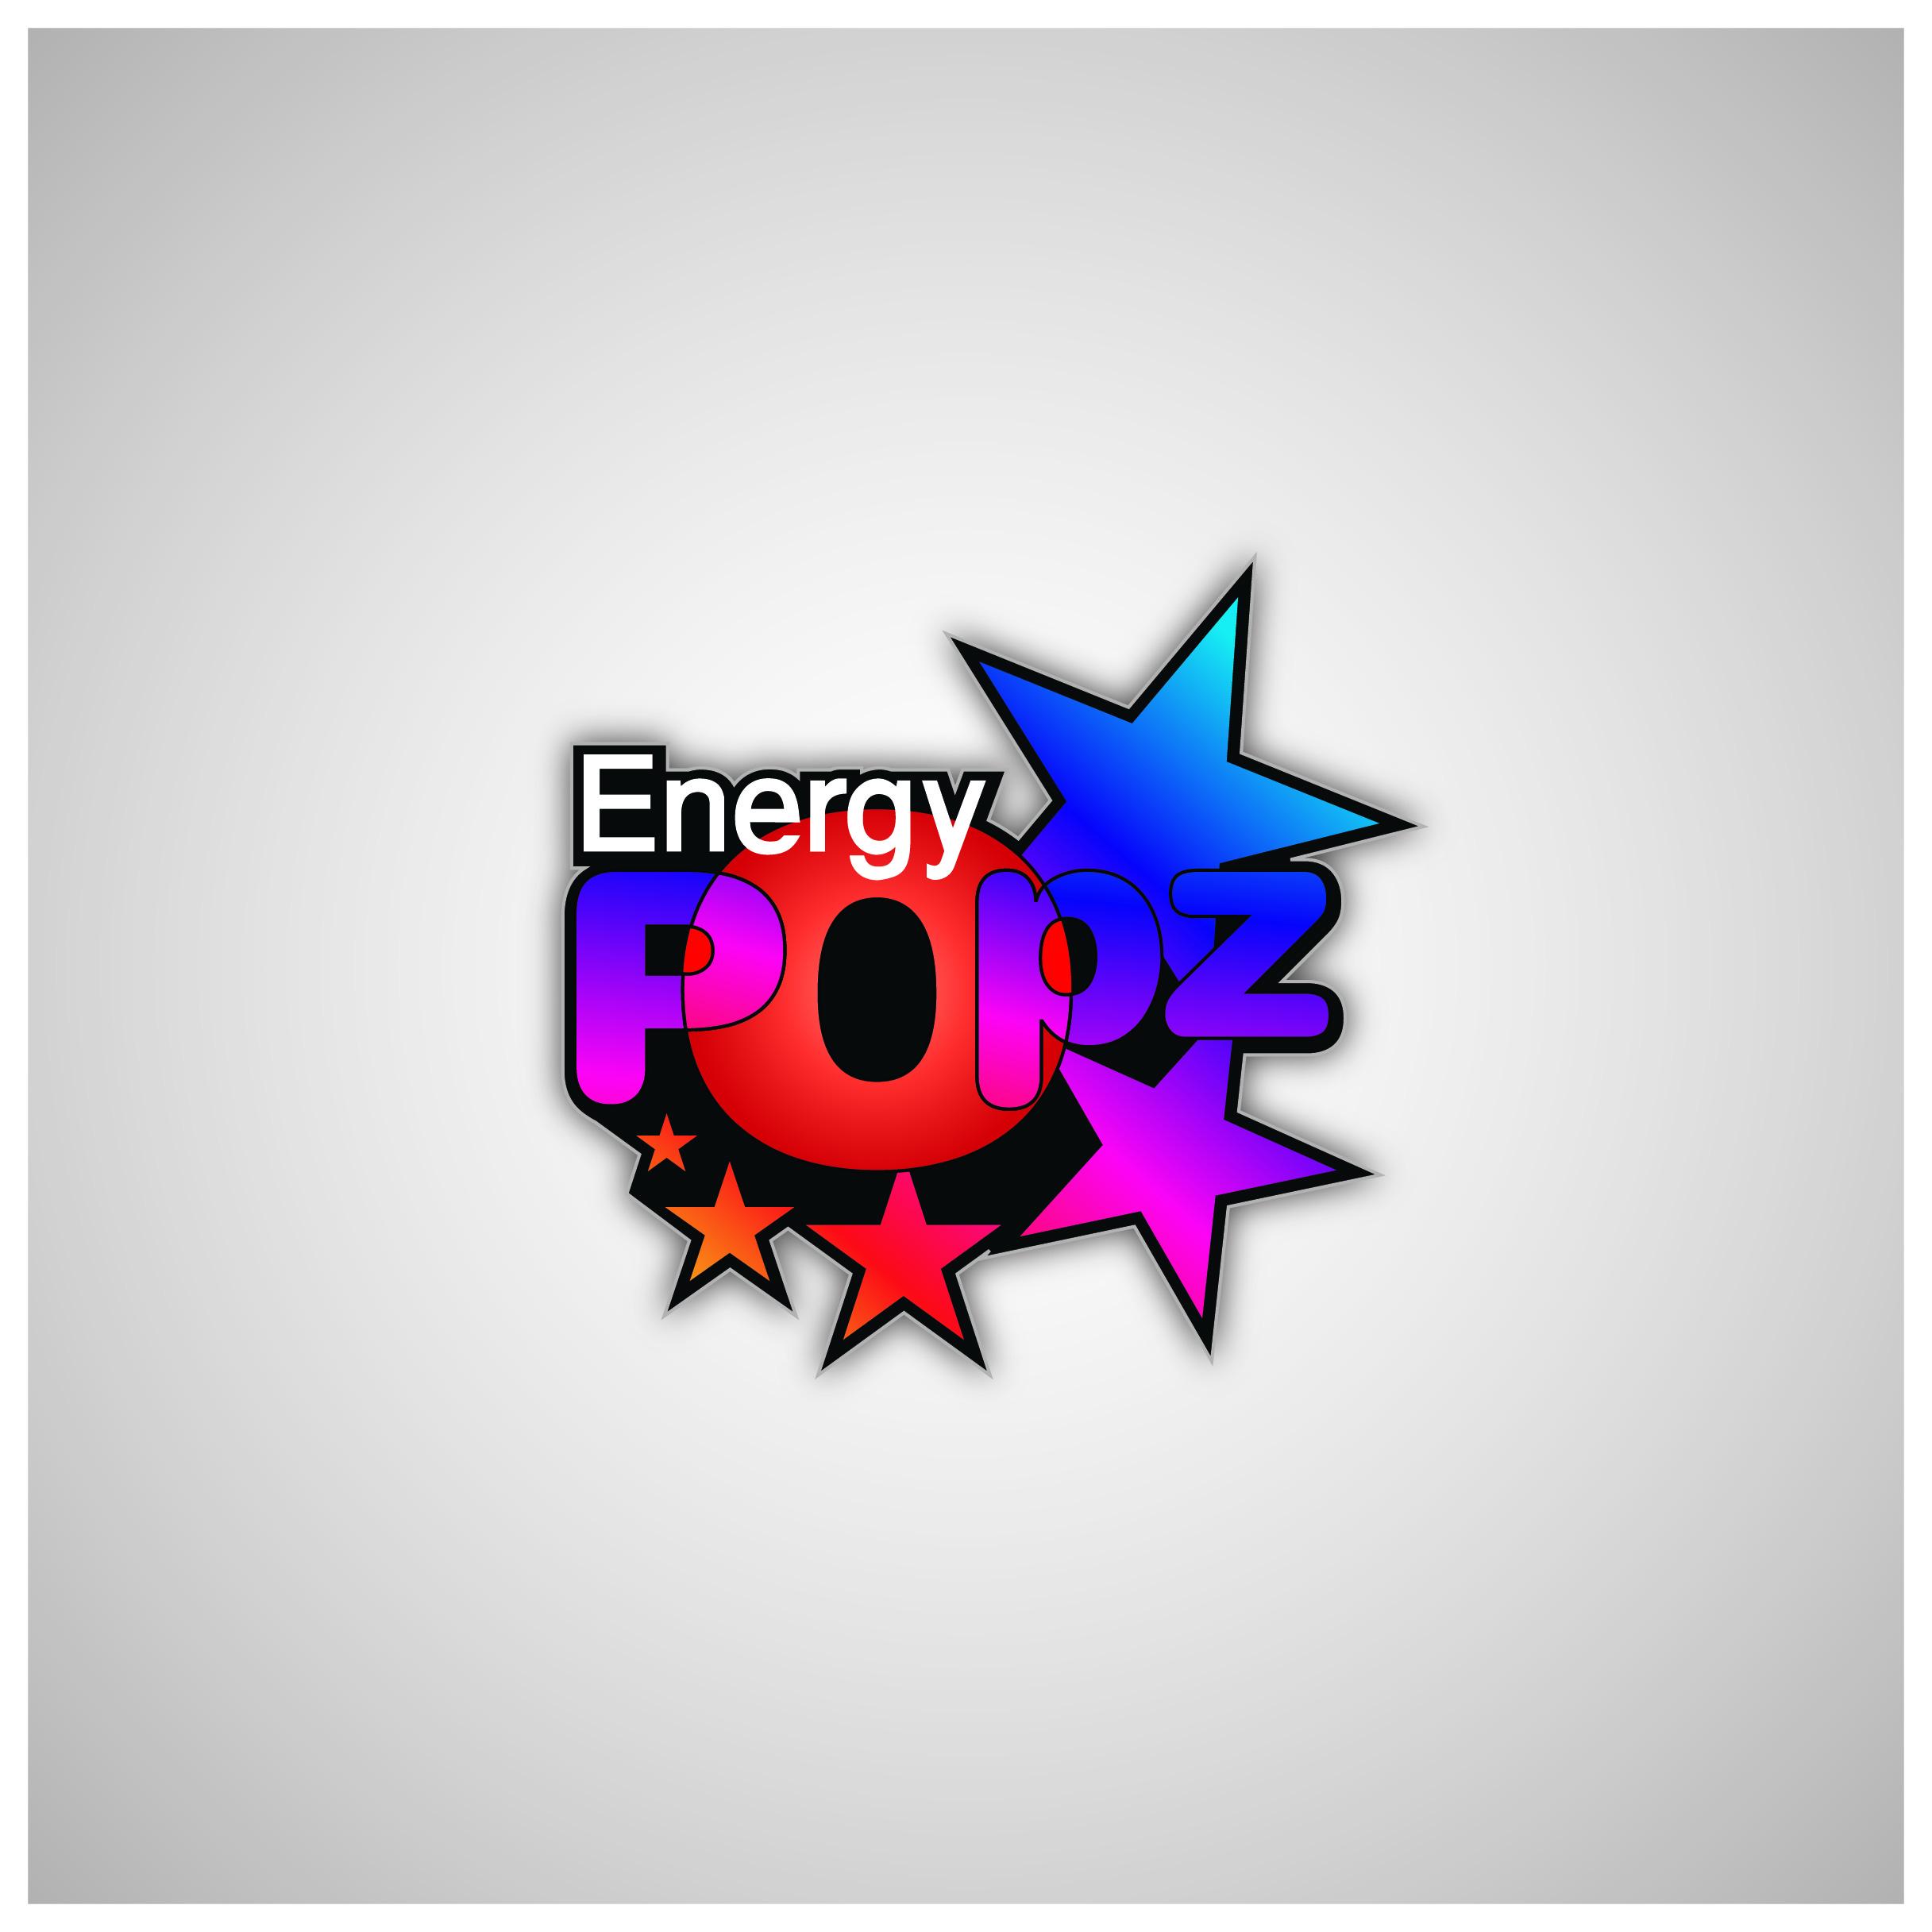 Logo Design by Sampath Gunathilaka - Entry No. 8 in the Logo Design Contest Energy Popz Logo Design.